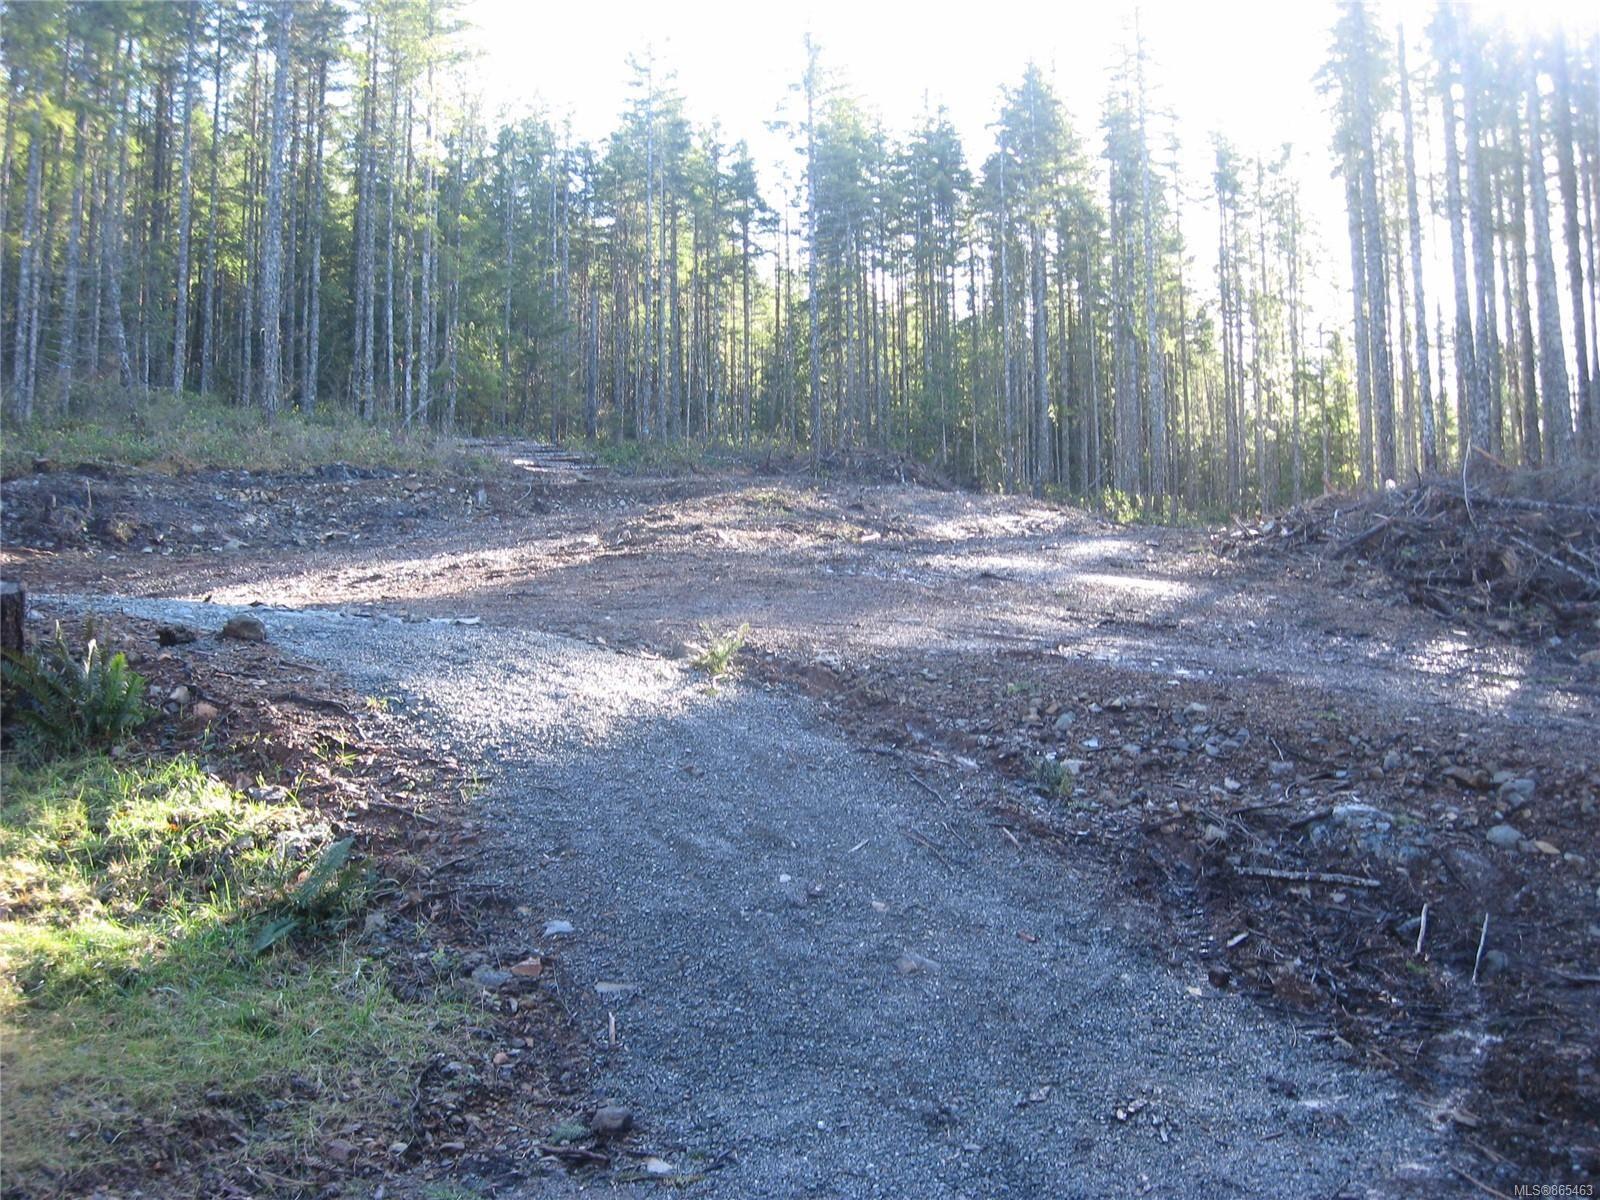 Photo 18: Photos: 1230 Cottonwood Rd in : NI Kelsey Bay/Sayward Land for sale (North Island)  : MLS®# 865463